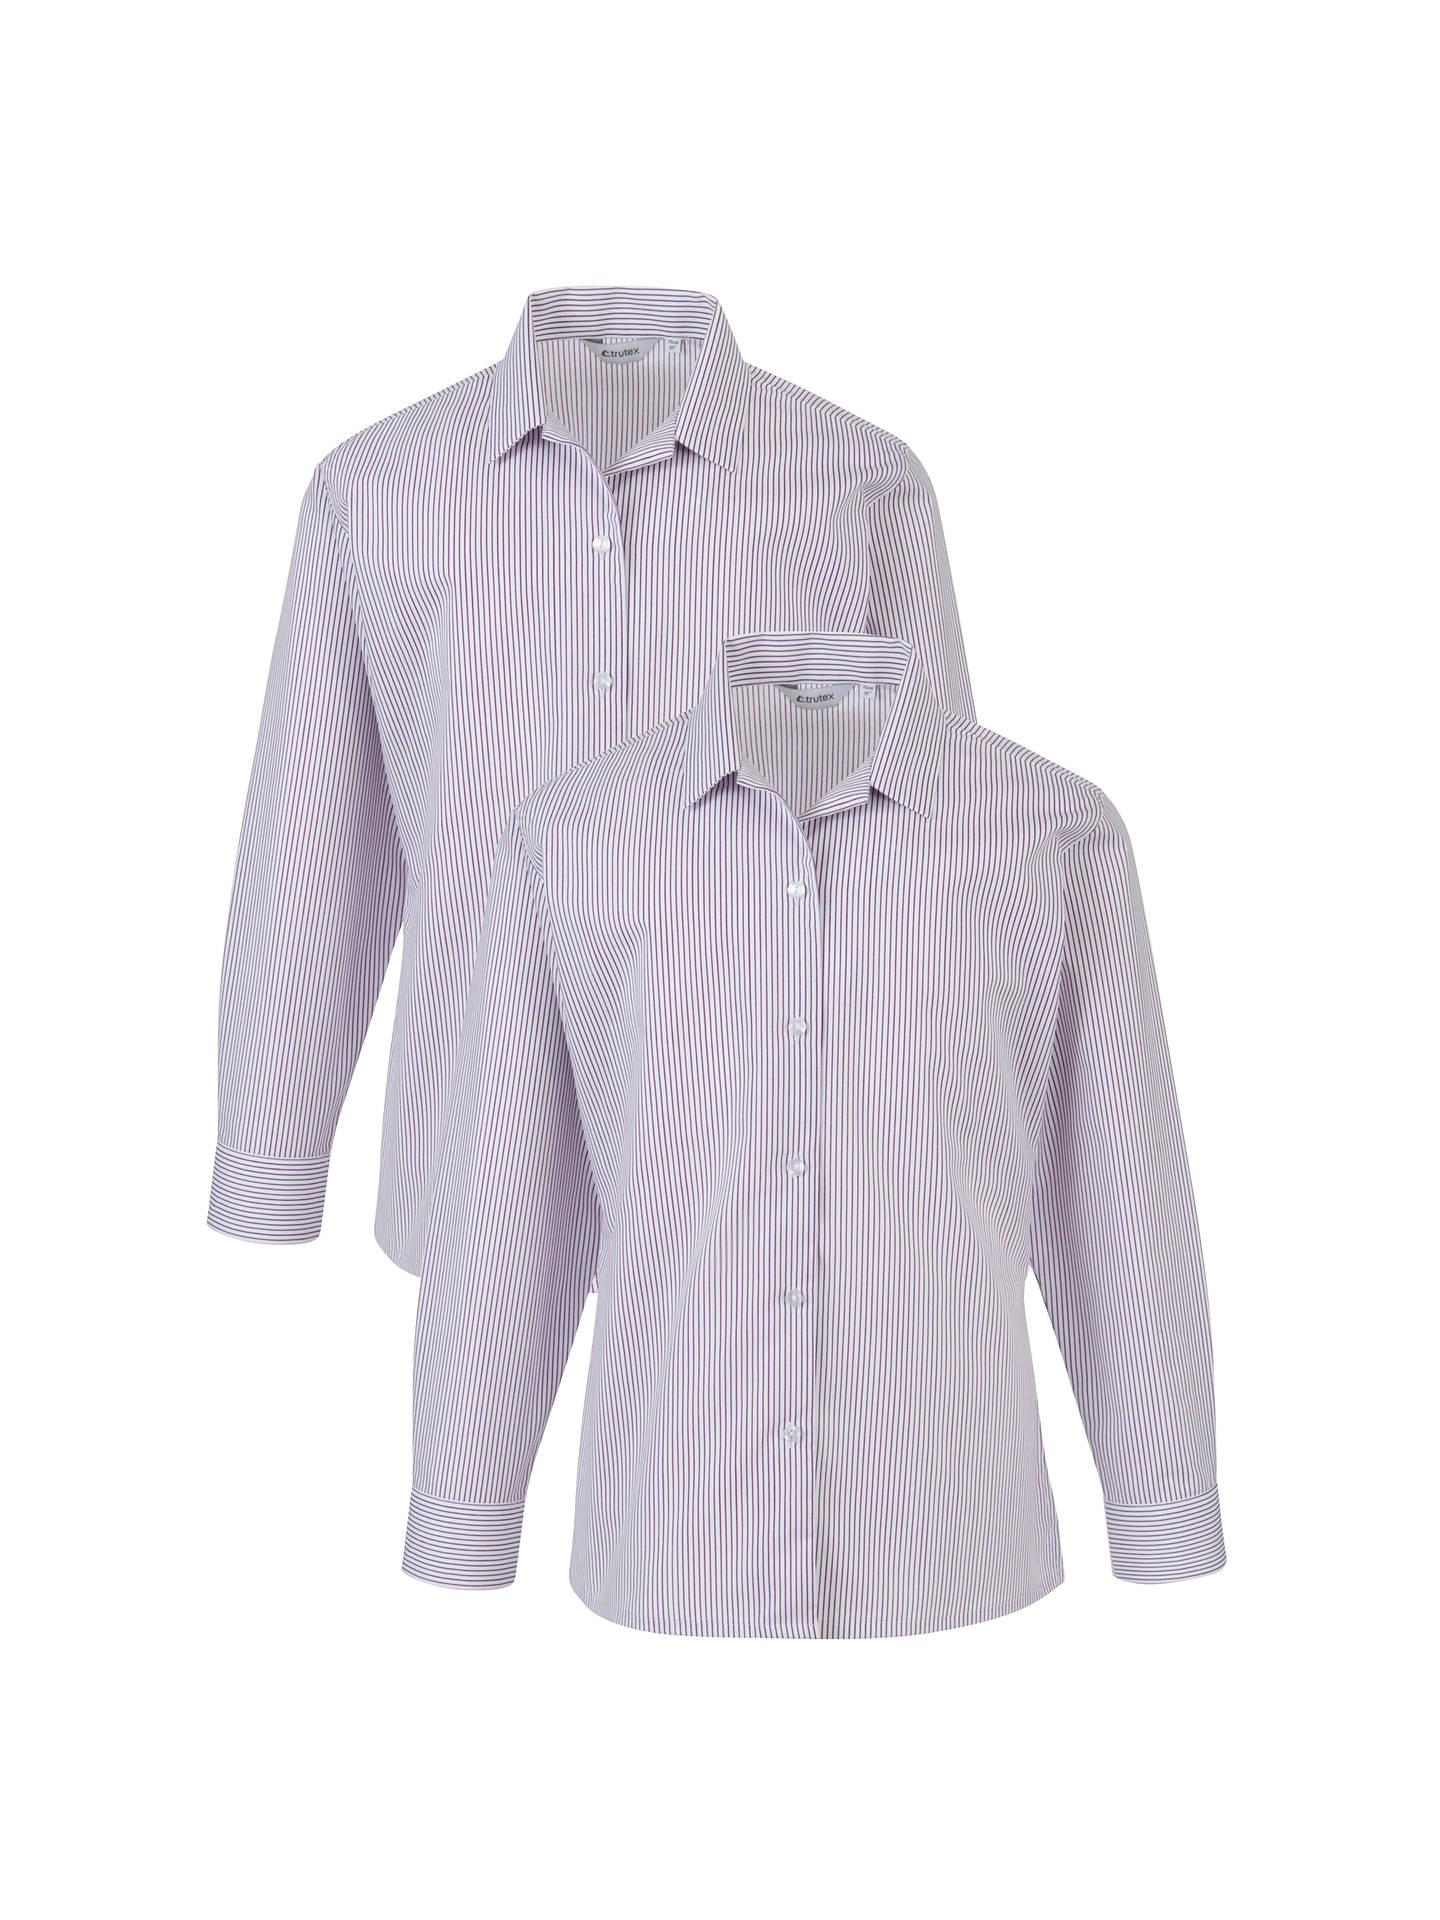 2 Pack Girls Ladies School Uniform Long Sleeve Revere Collar Shirt Blouse Office